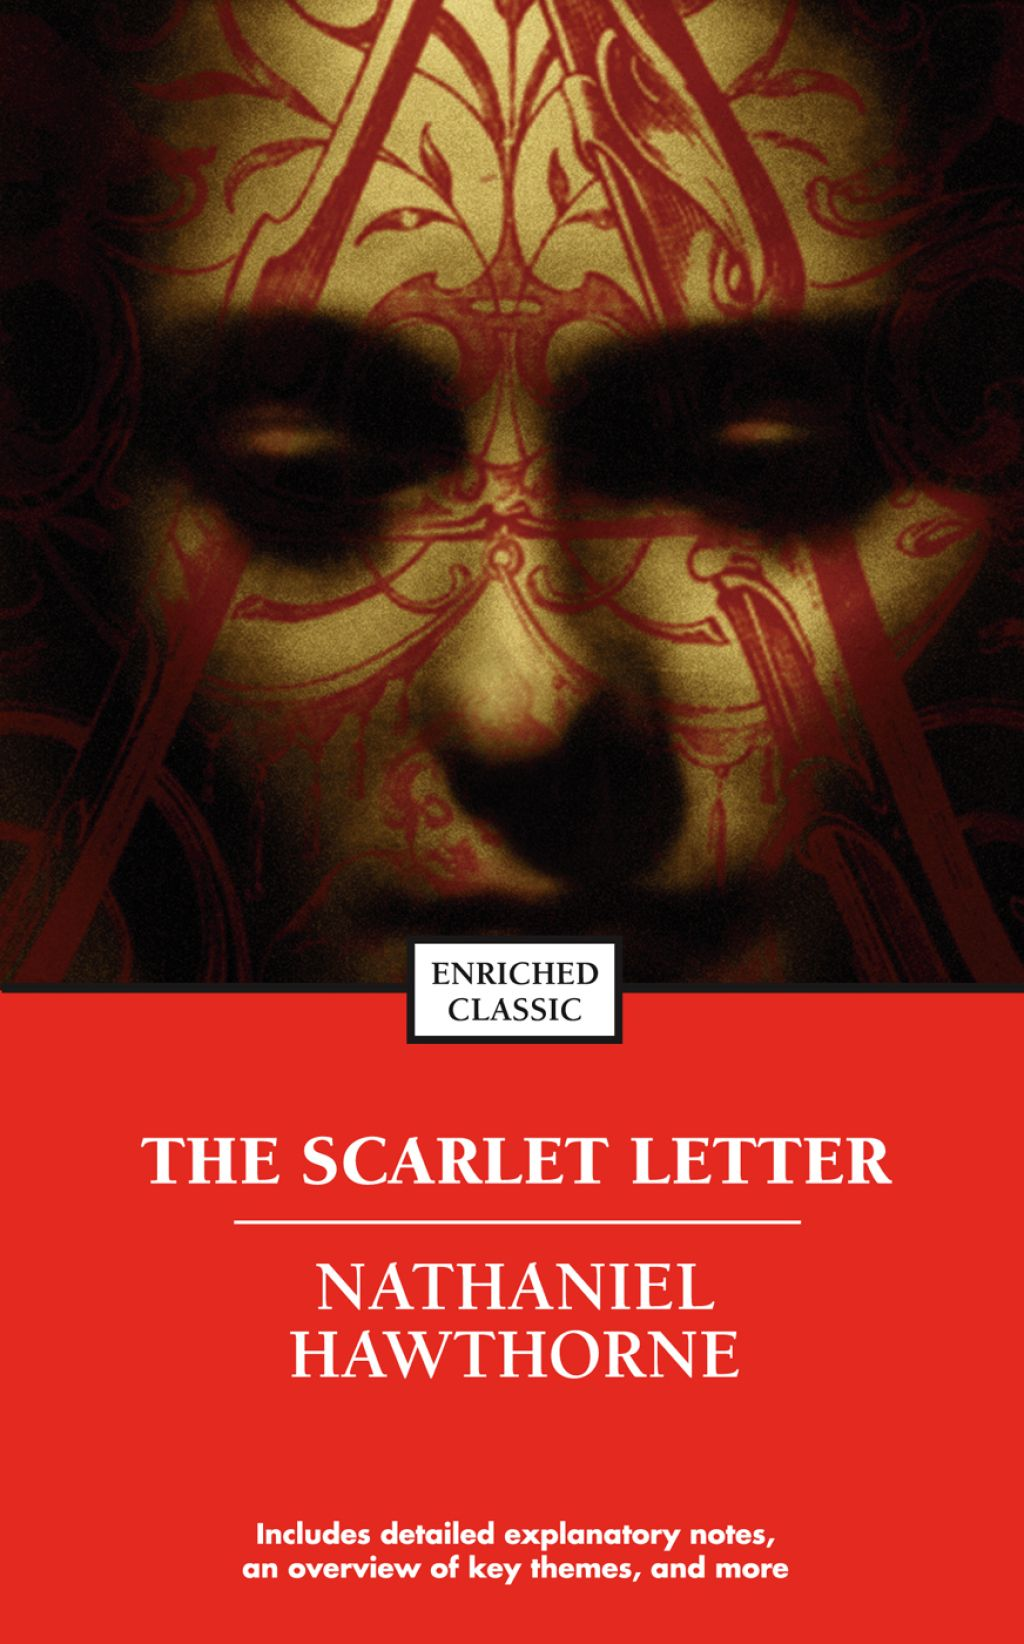 The Scarlet Letter (eBook) The scarlet letter book, Book